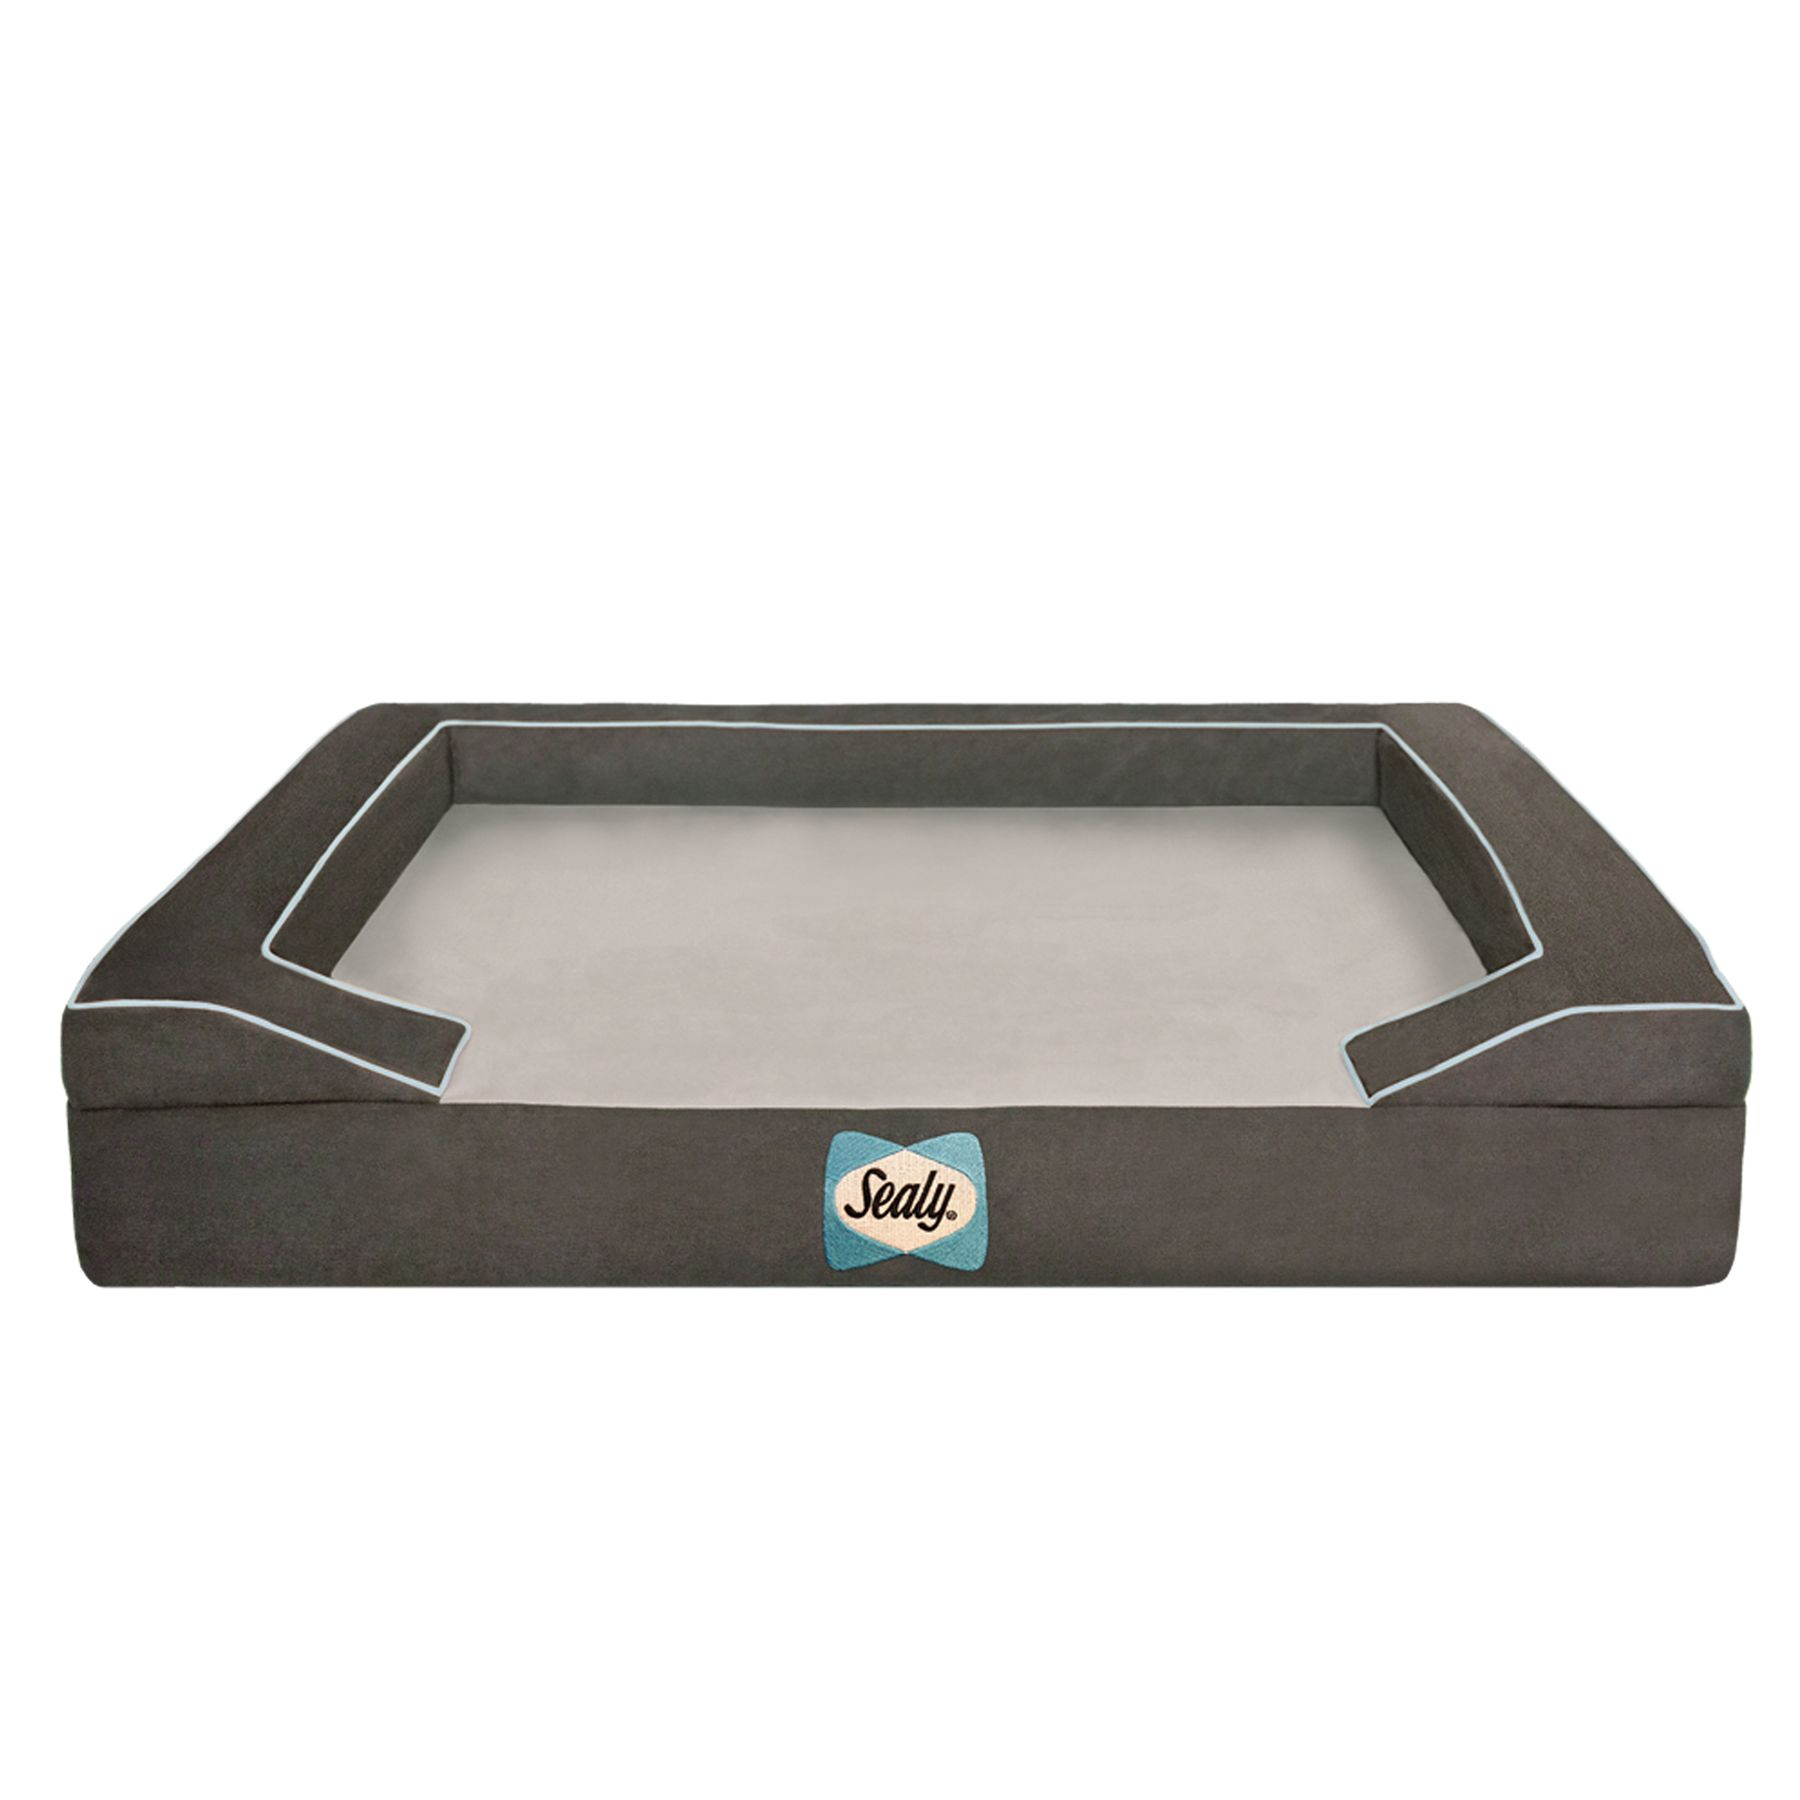 Sealy Premium Bolster Dog Bed Size 25l X 20w X 5.5h Modern Gray